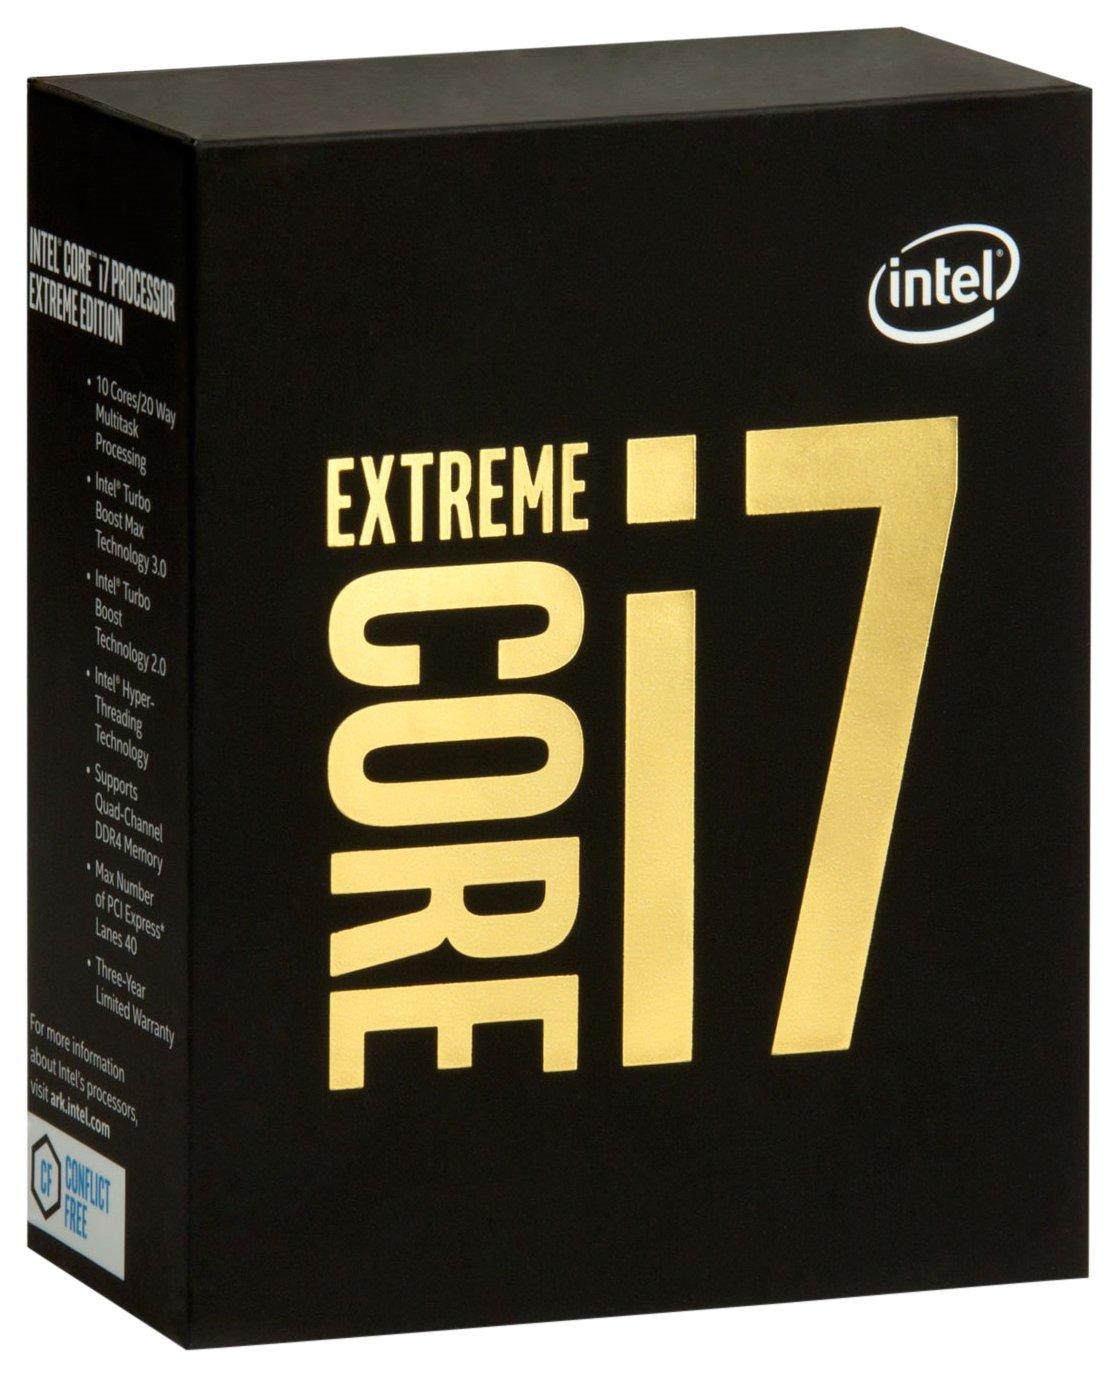 Intel Core i7-6950X 3GHz 20MB Smart Cache Box - processors (Intel Core i7-6xxx, LGA 2011-v3, PC, i7-